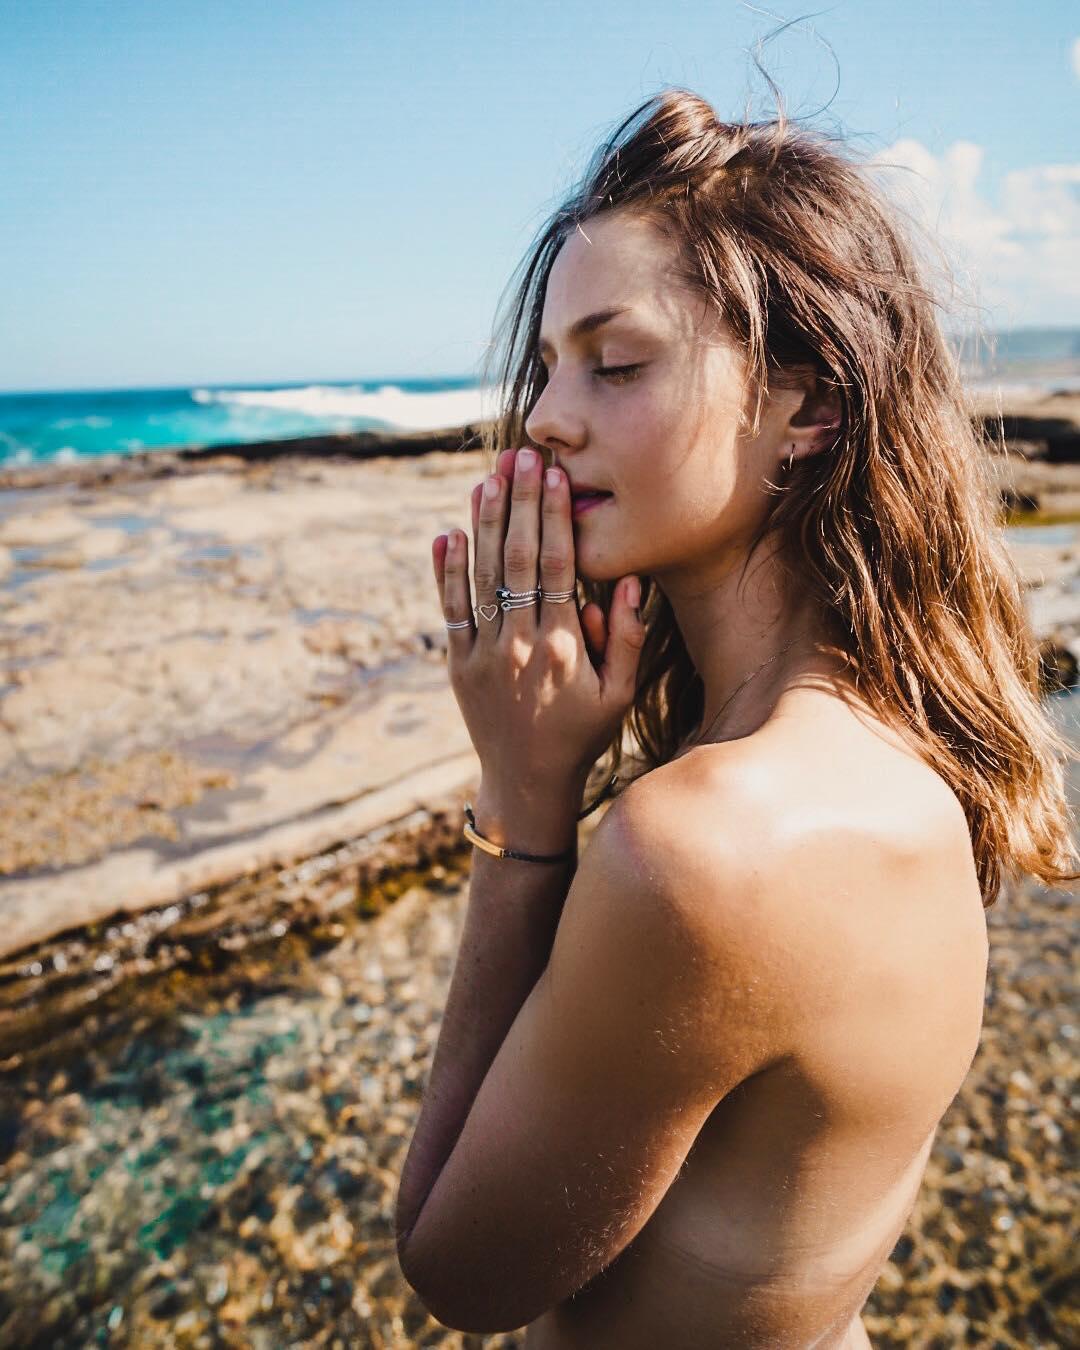 Isabelle Cornish mostra-se nua na natureza e fãs ficam divididos